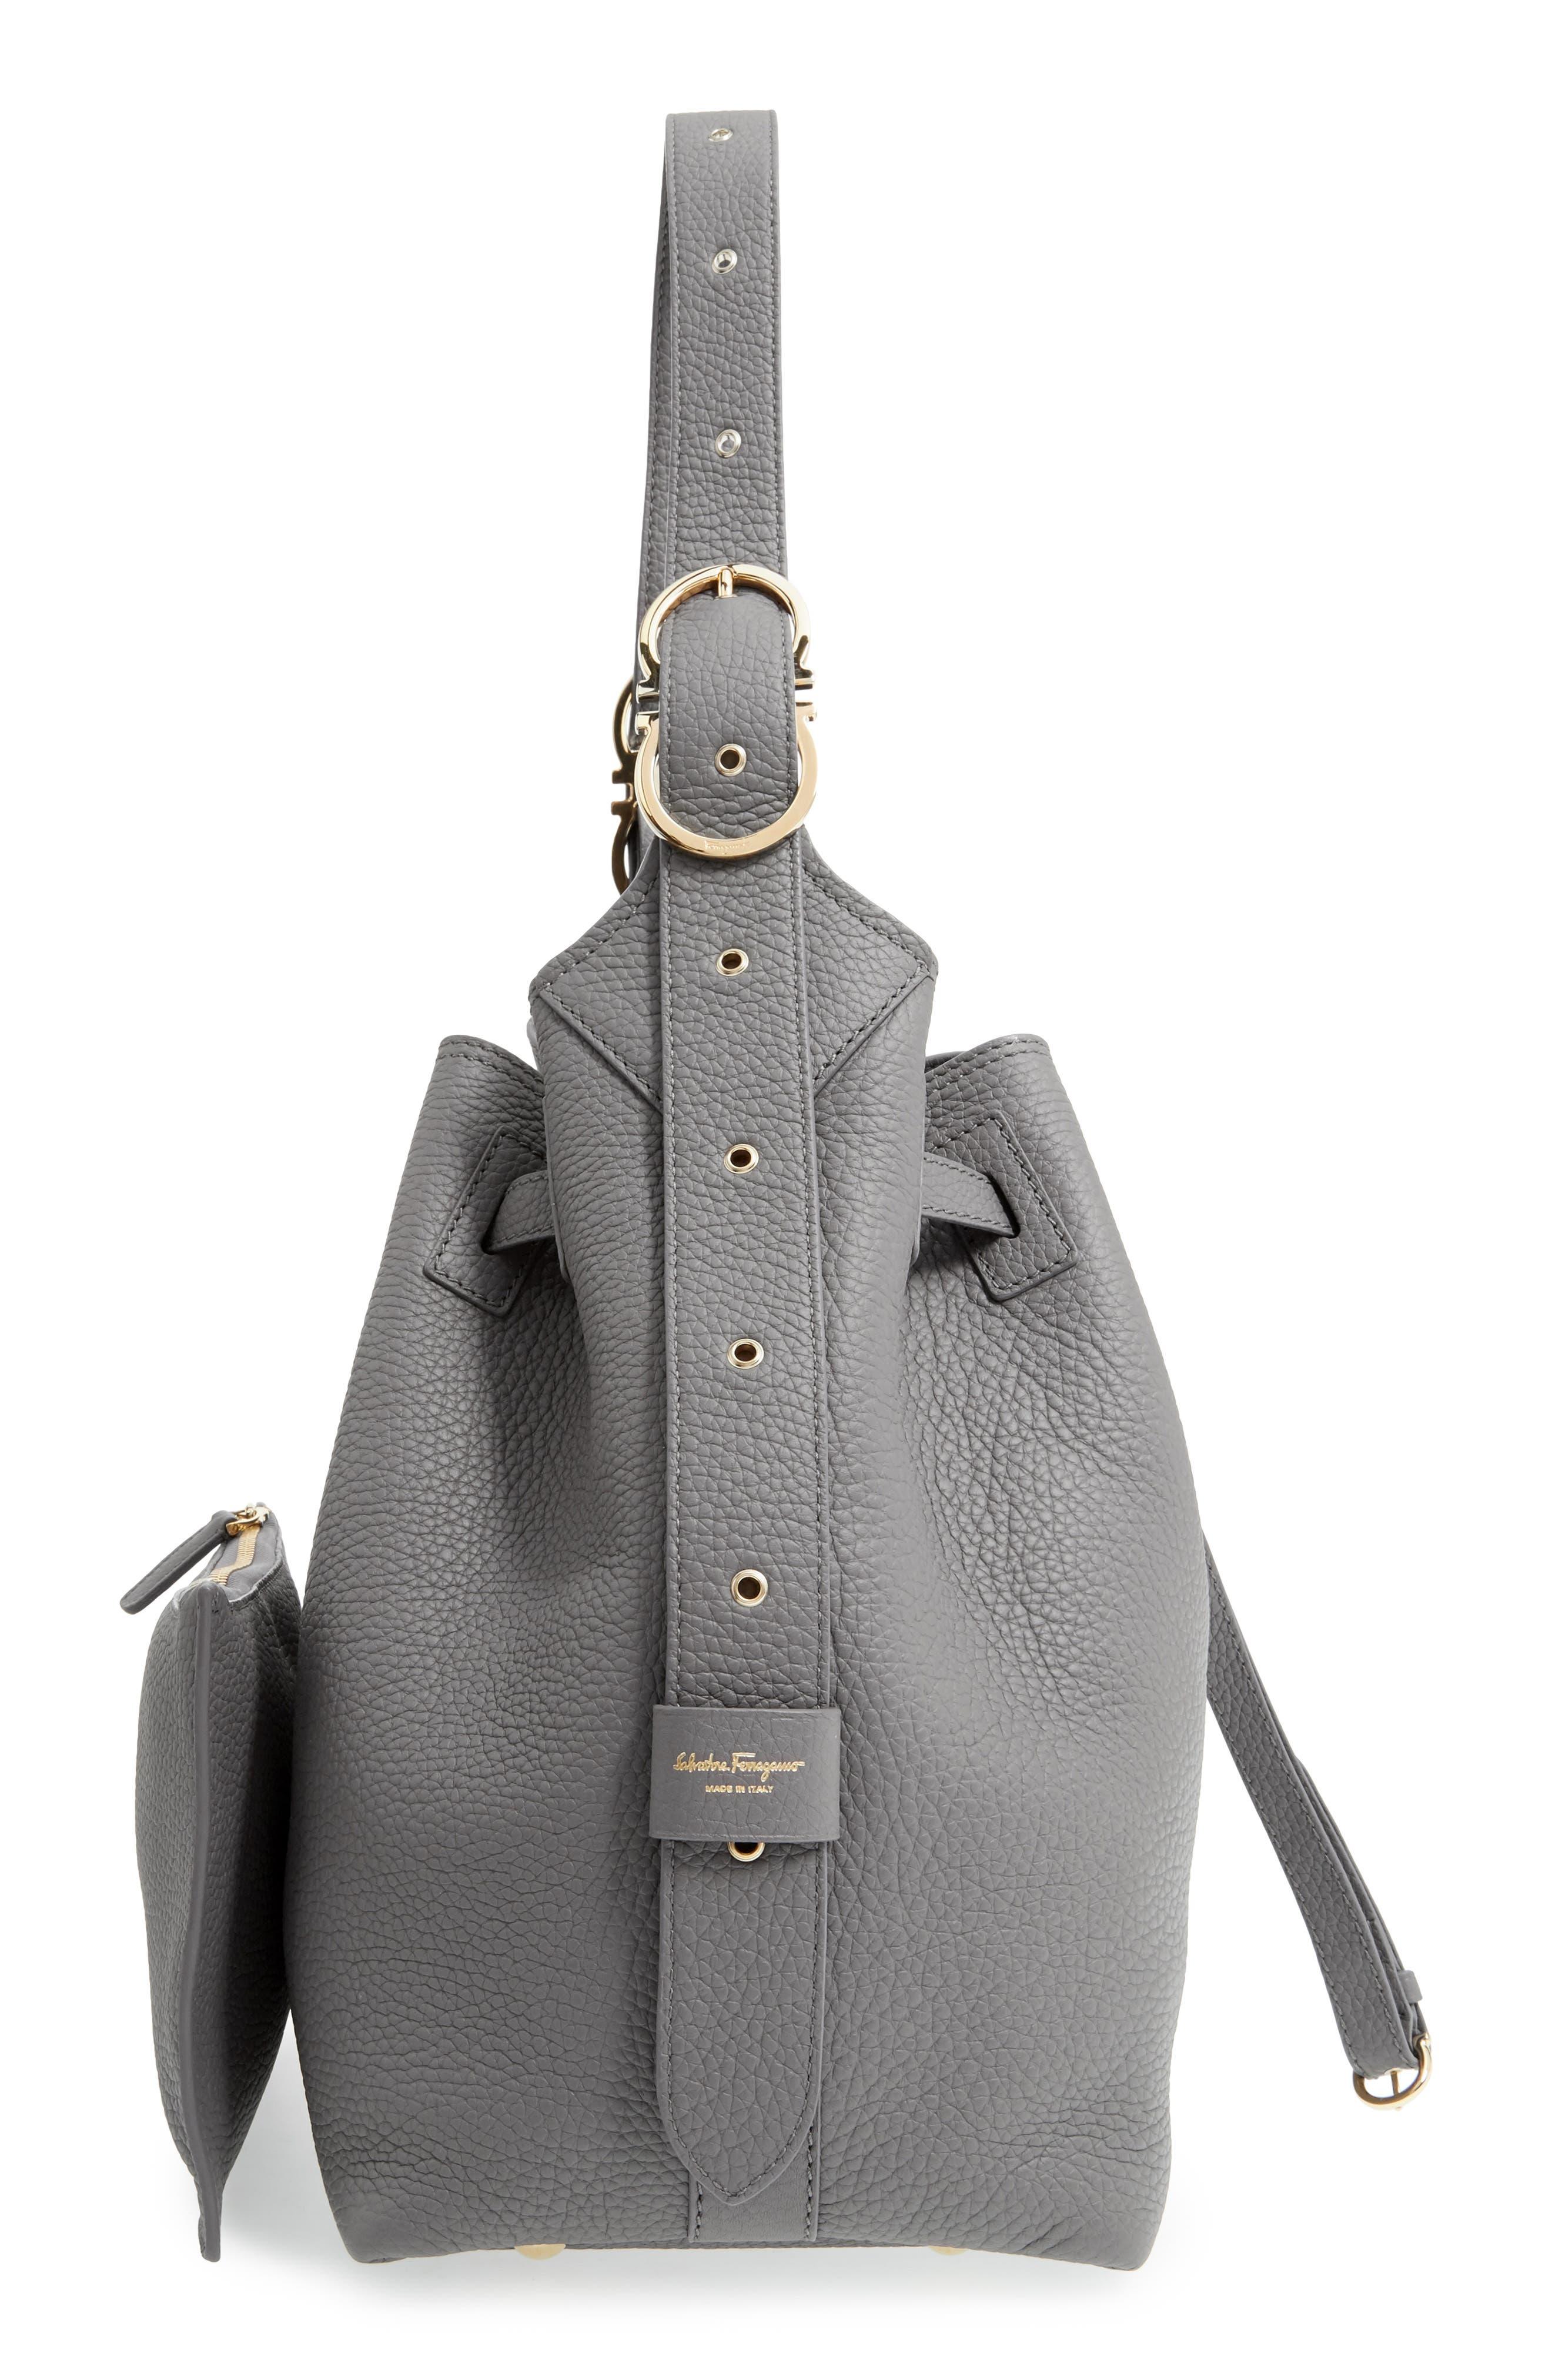 SALVATORE FERRAGAMO,                             Pebbled Leather Drawstring Bucket Bag,                             Alternate thumbnail 5, color,                             020